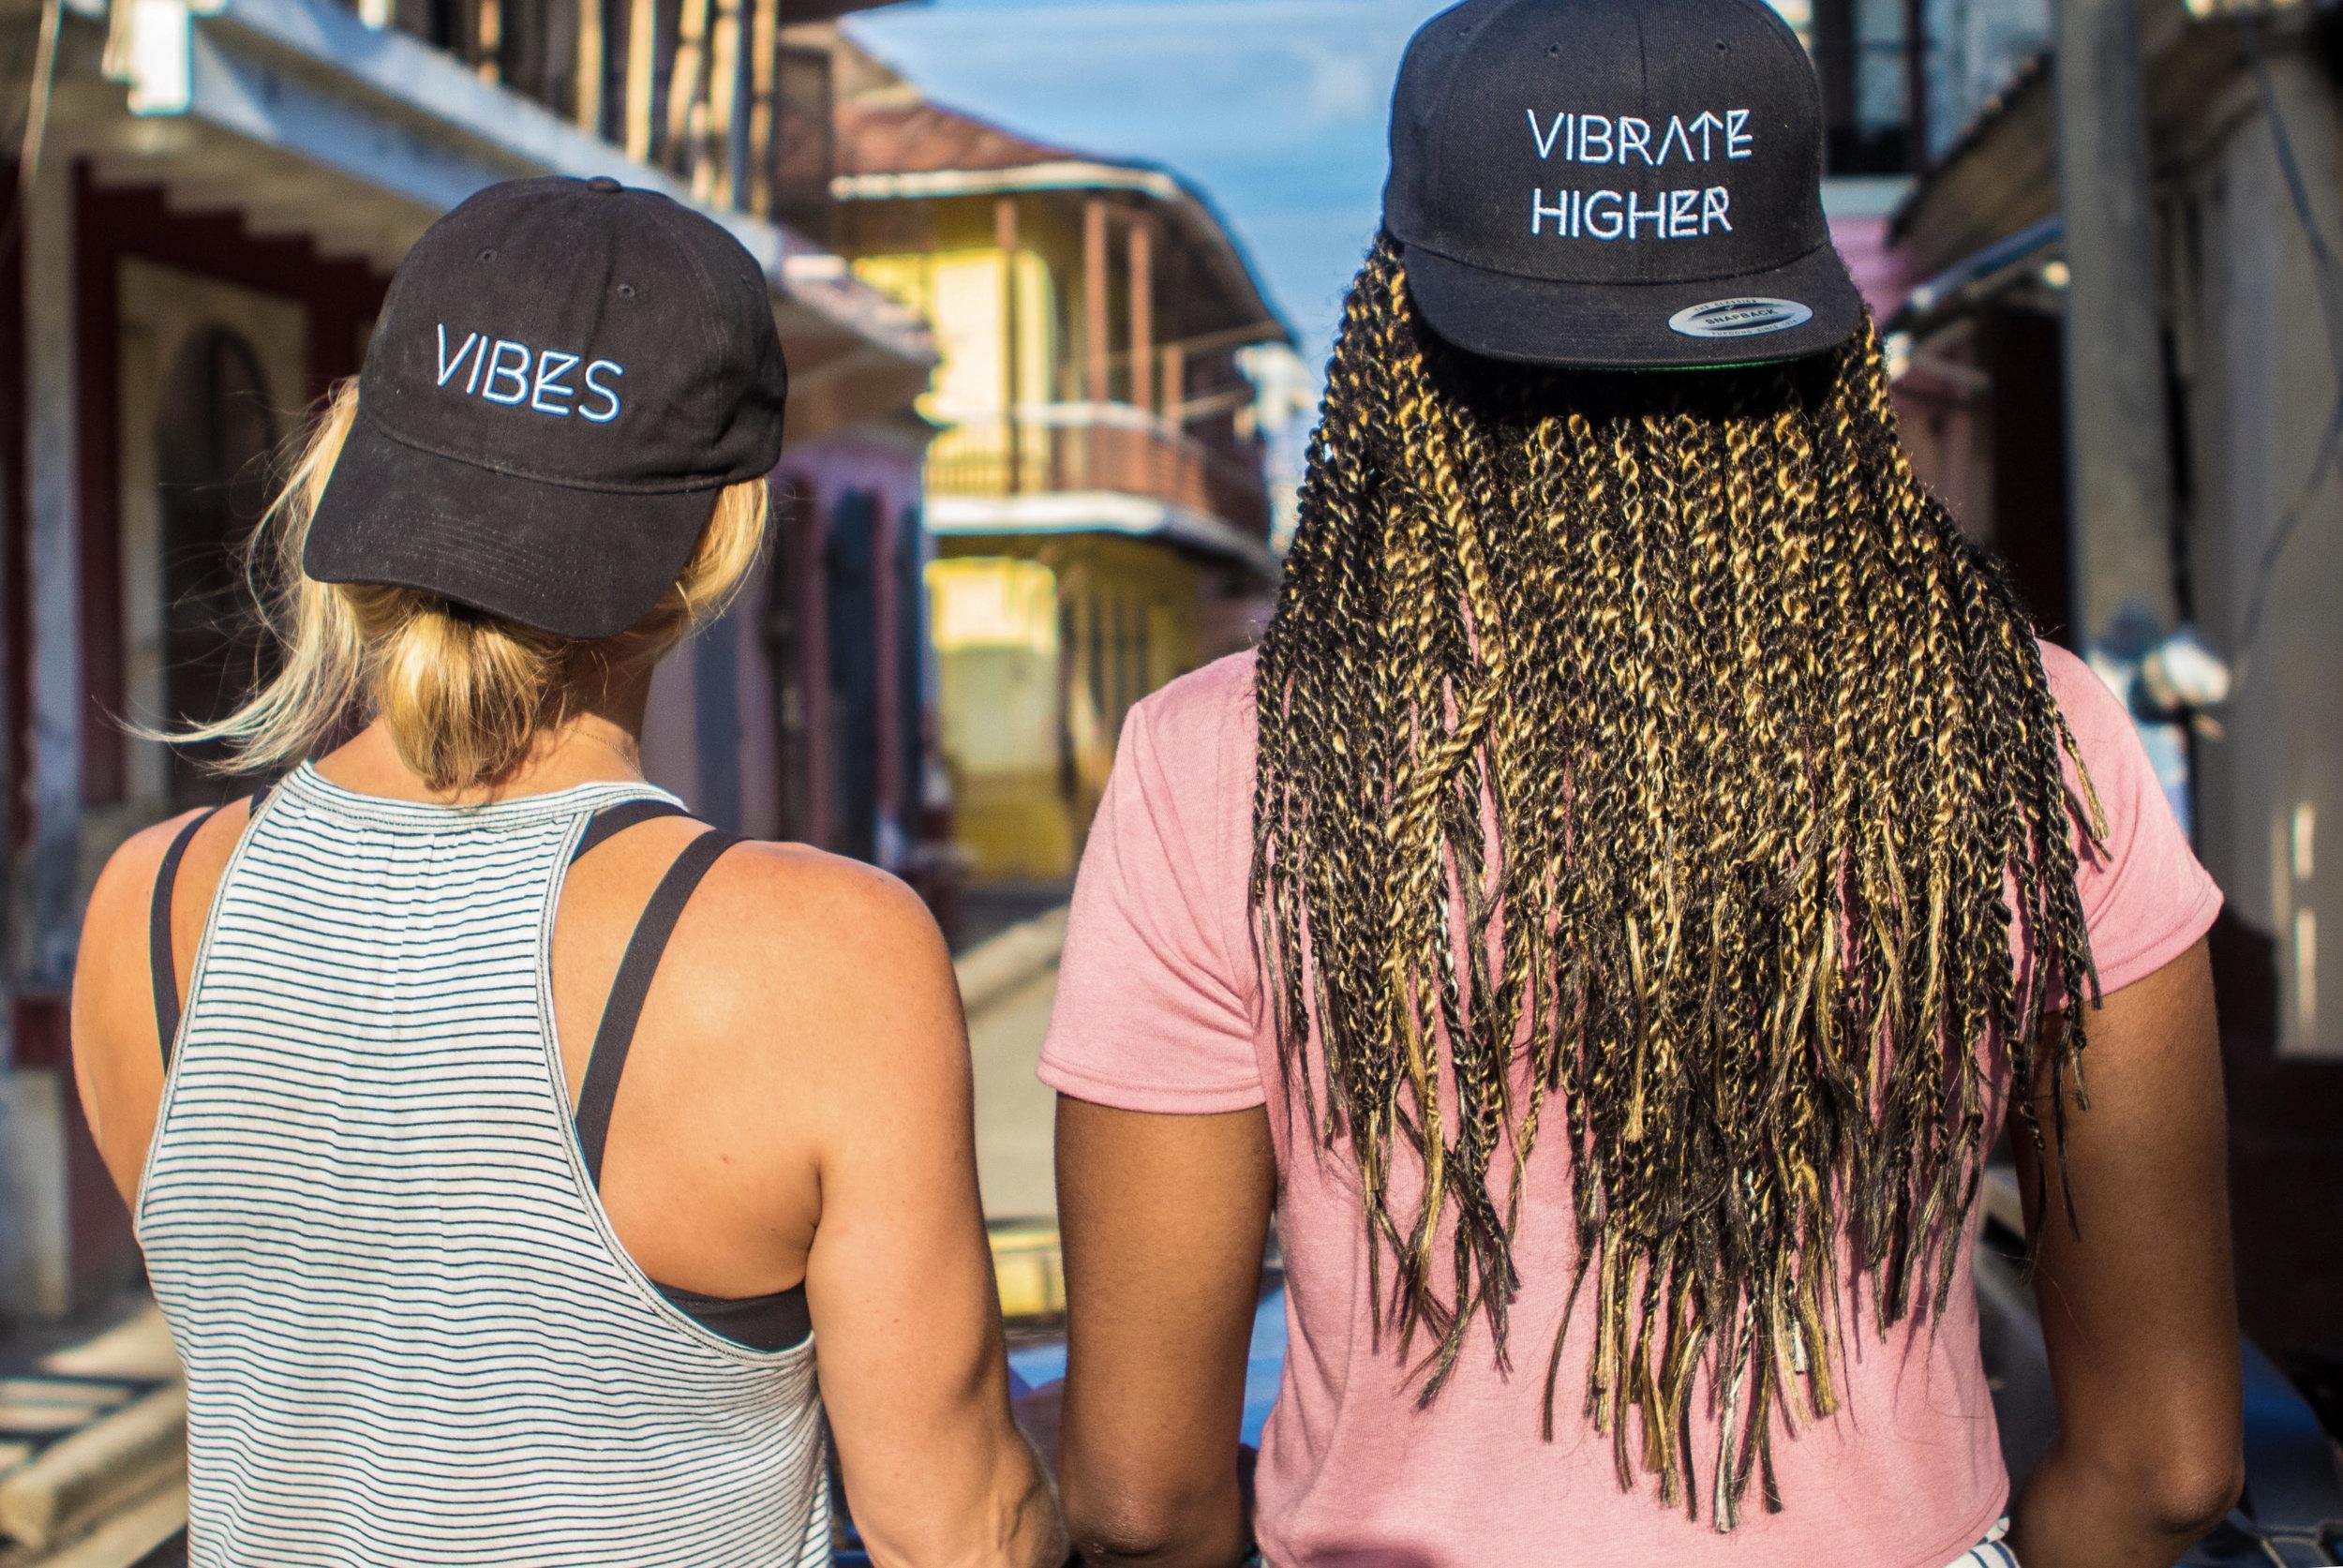 VibrateHigher2018_WT+Founder_Hats.jpg